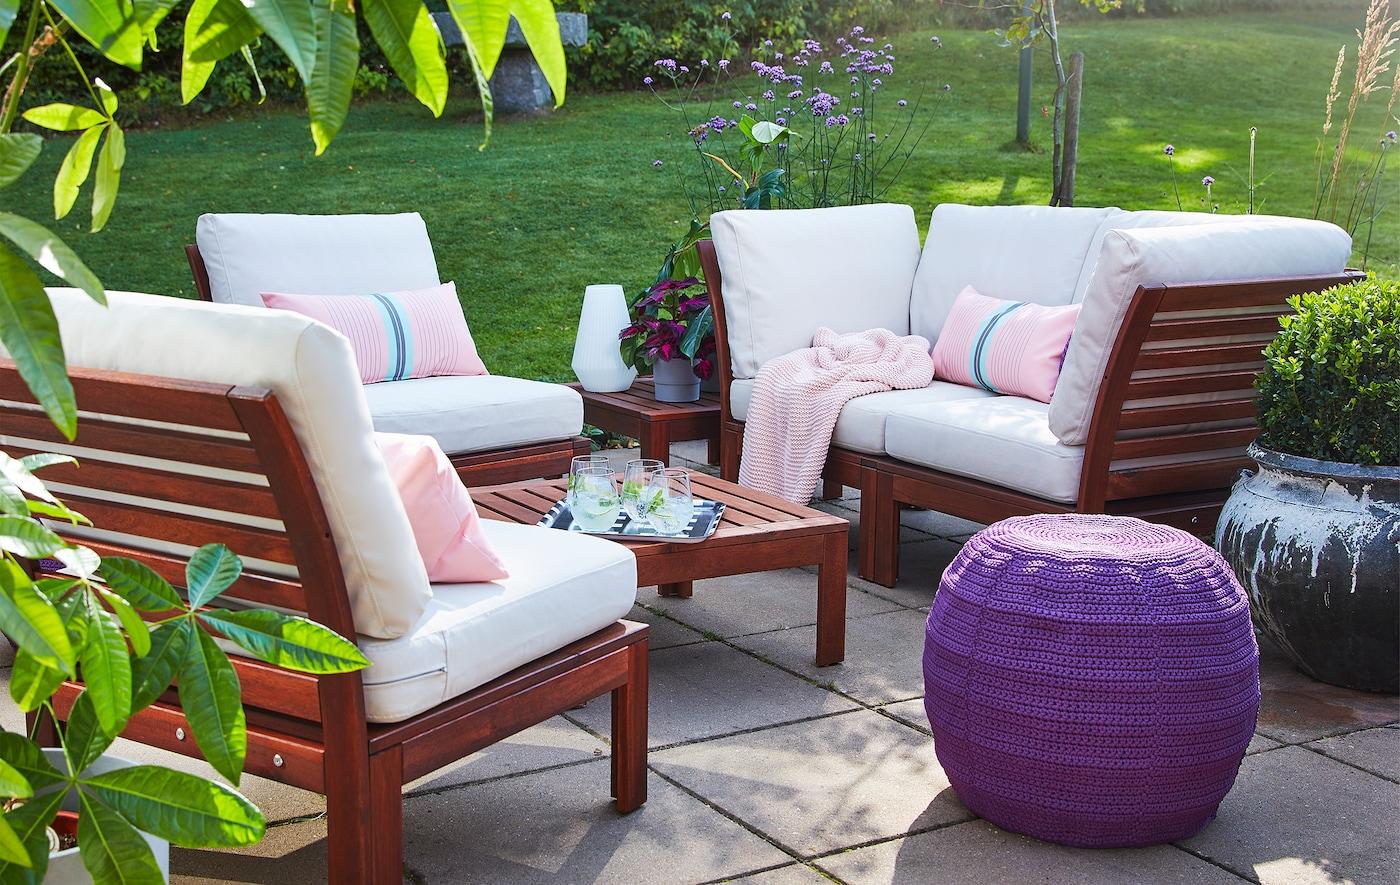 Ideas for decorating a terrace or garden